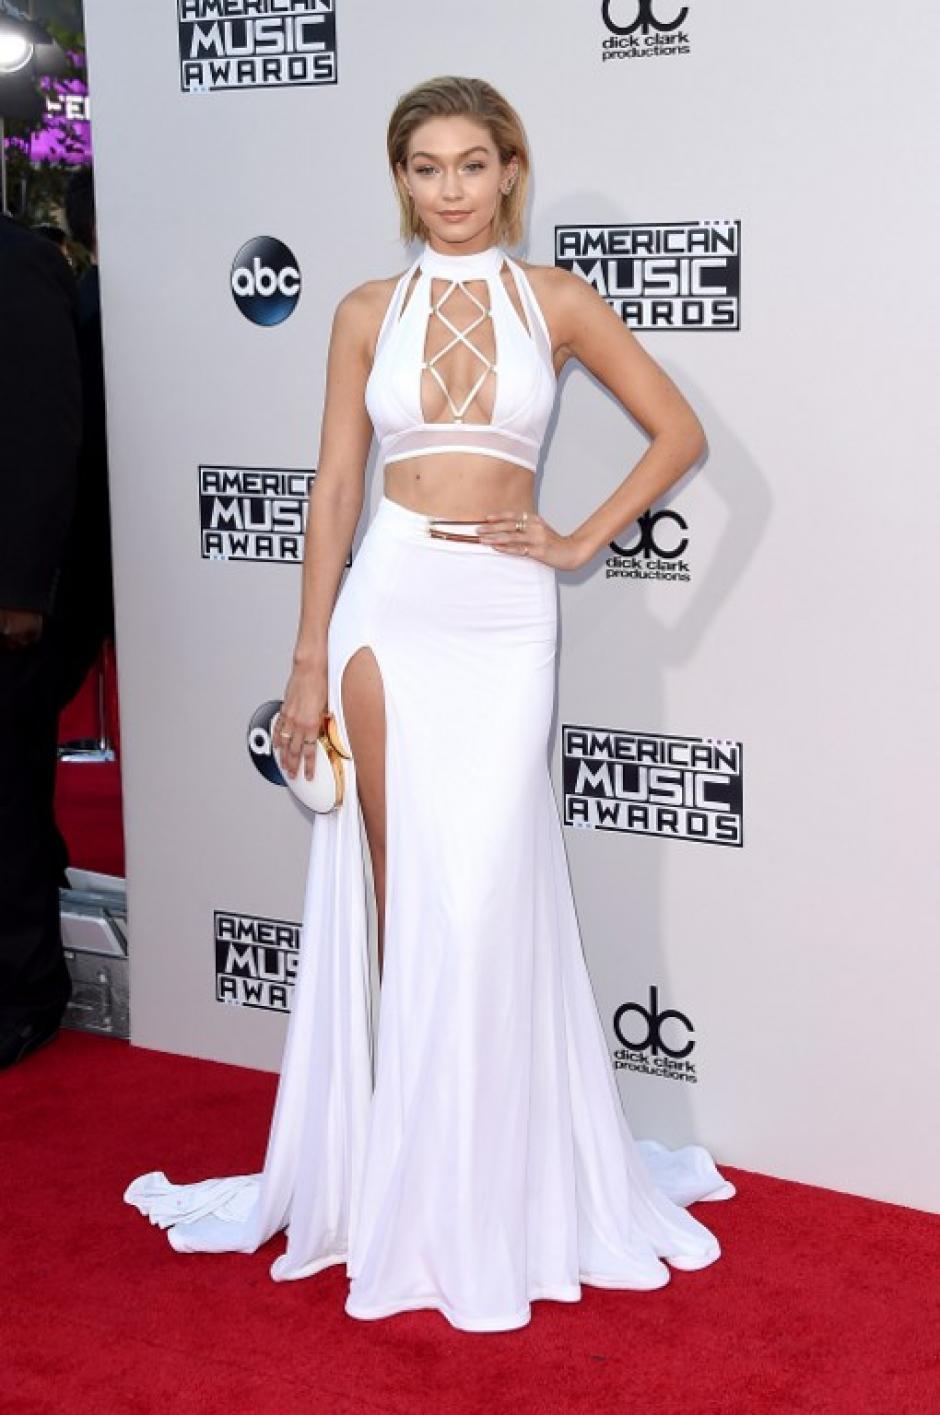 Modelo Gigi Hadid en los American Music Awards en Los Ángeles, California. (Foto: Jason Merritt / AFP)